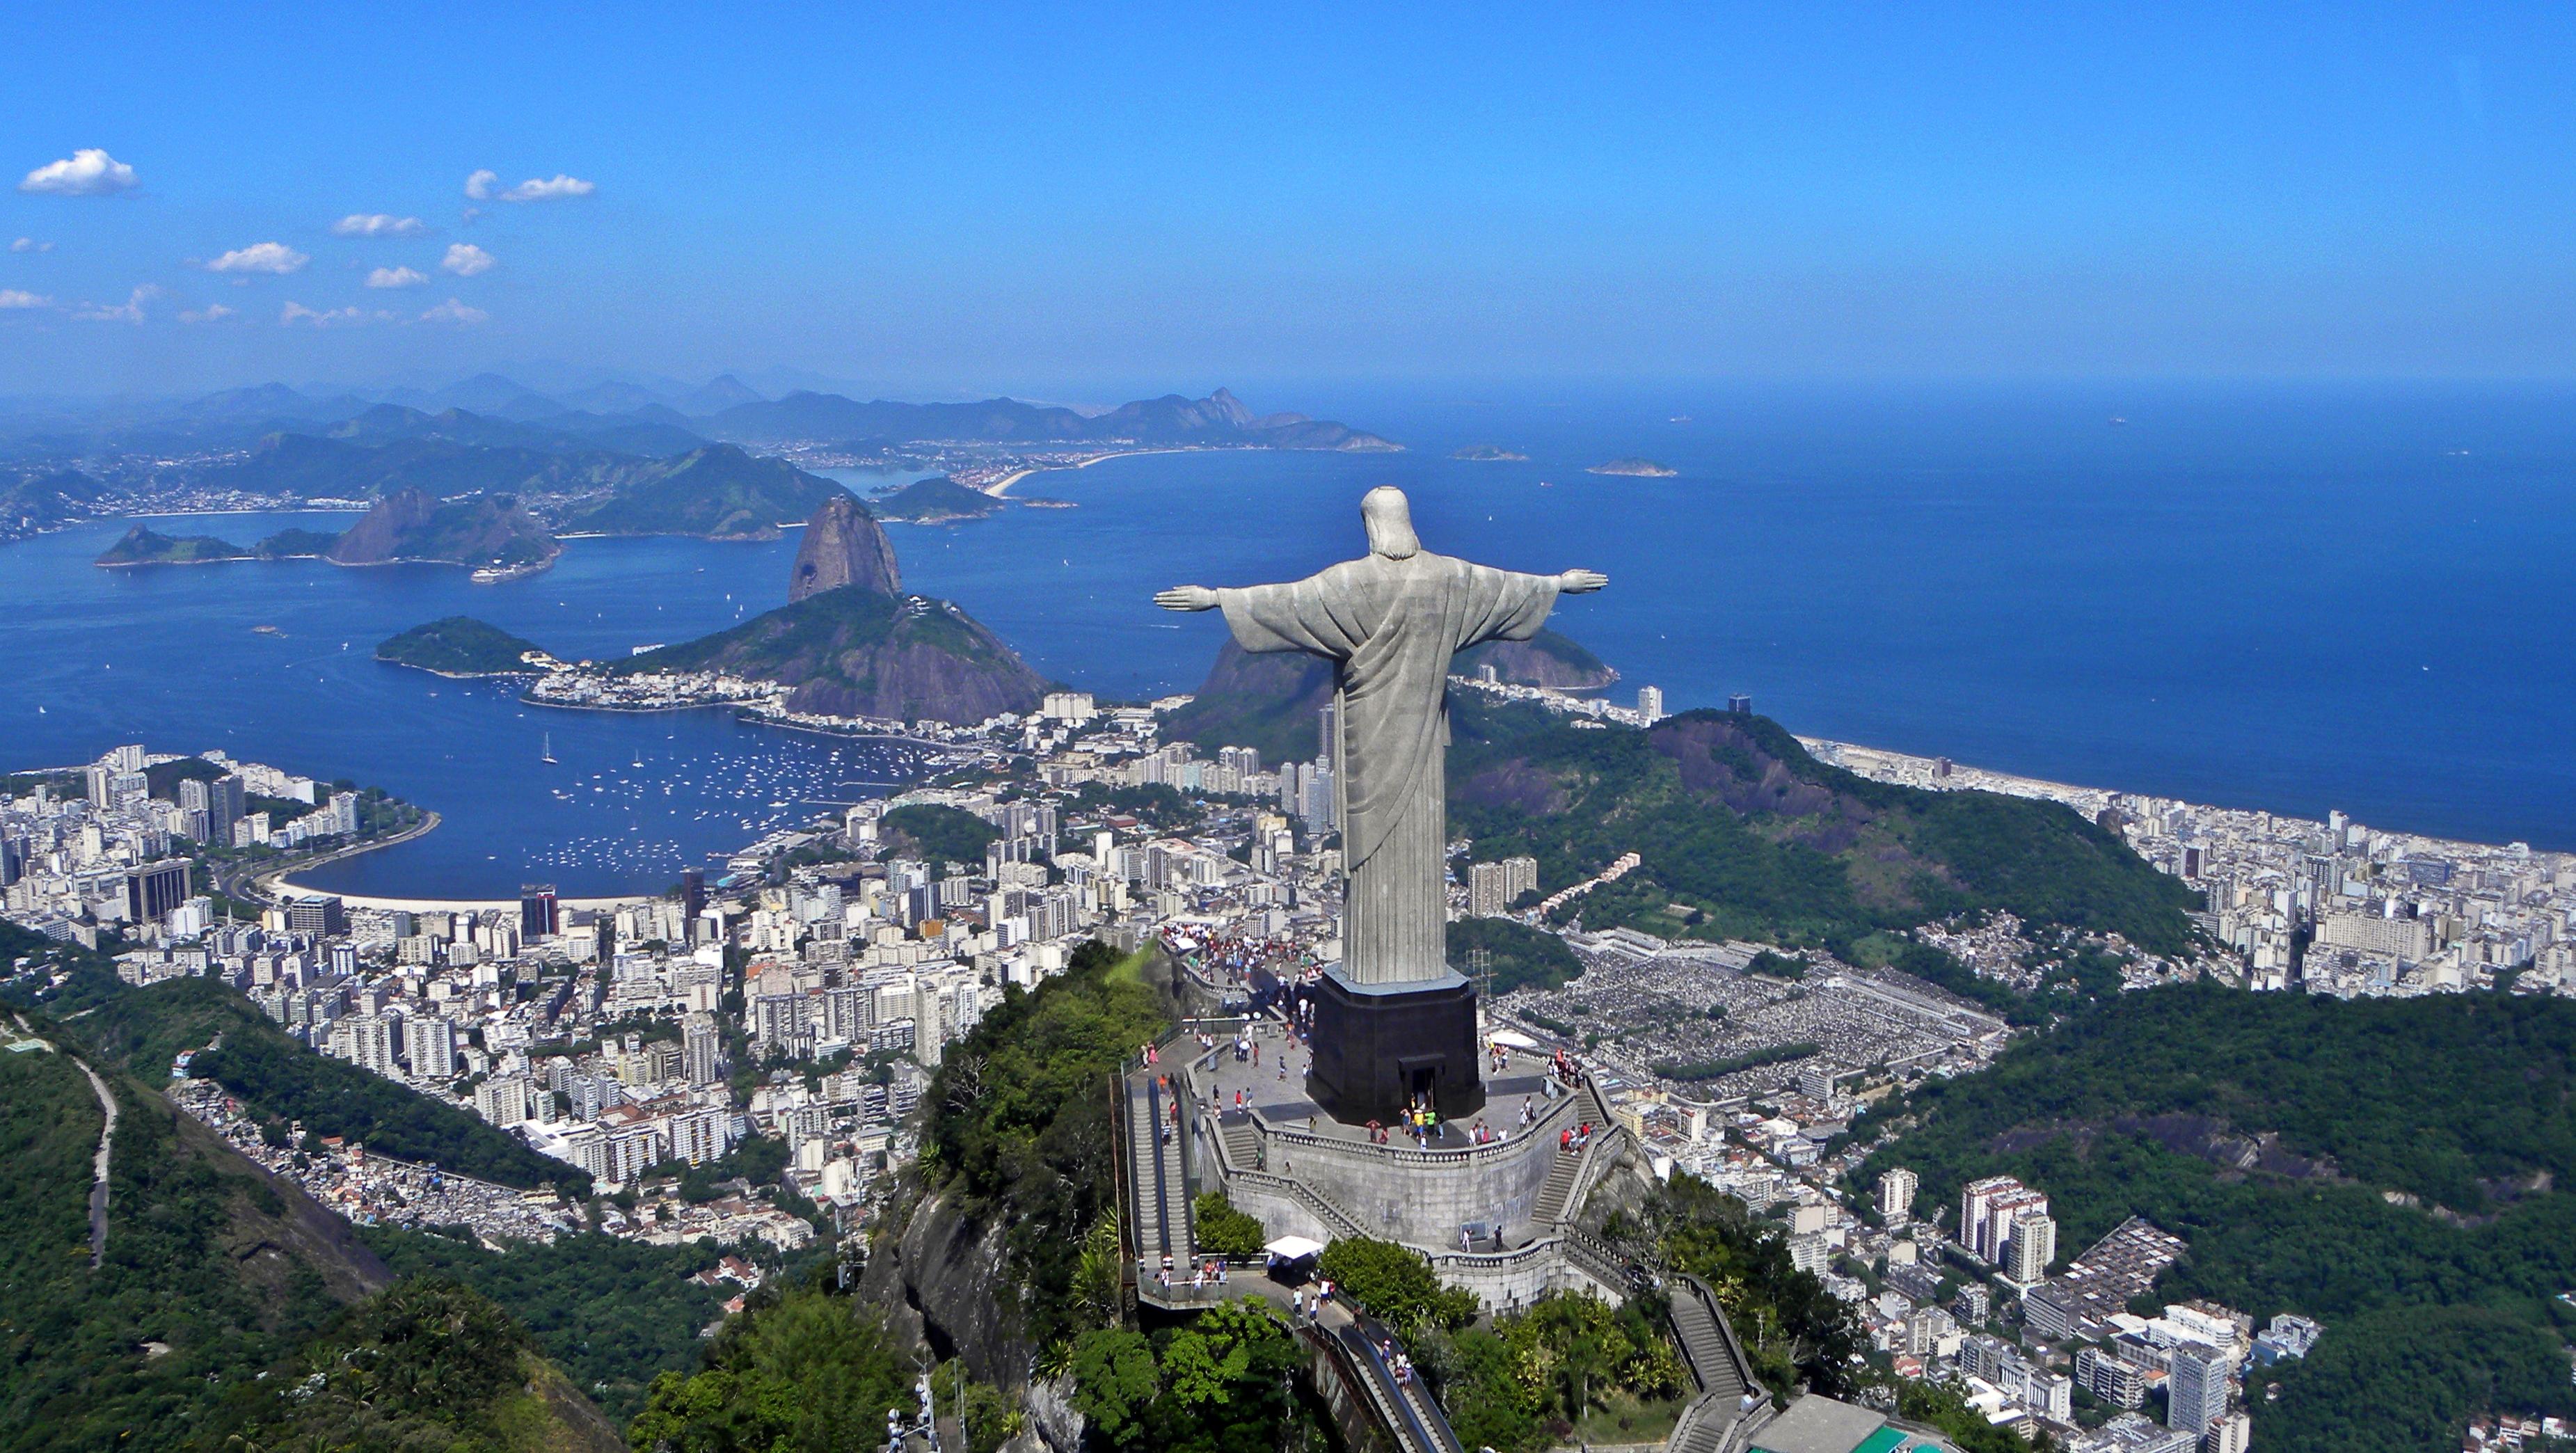 Rio 2016: Oxford's Olympians